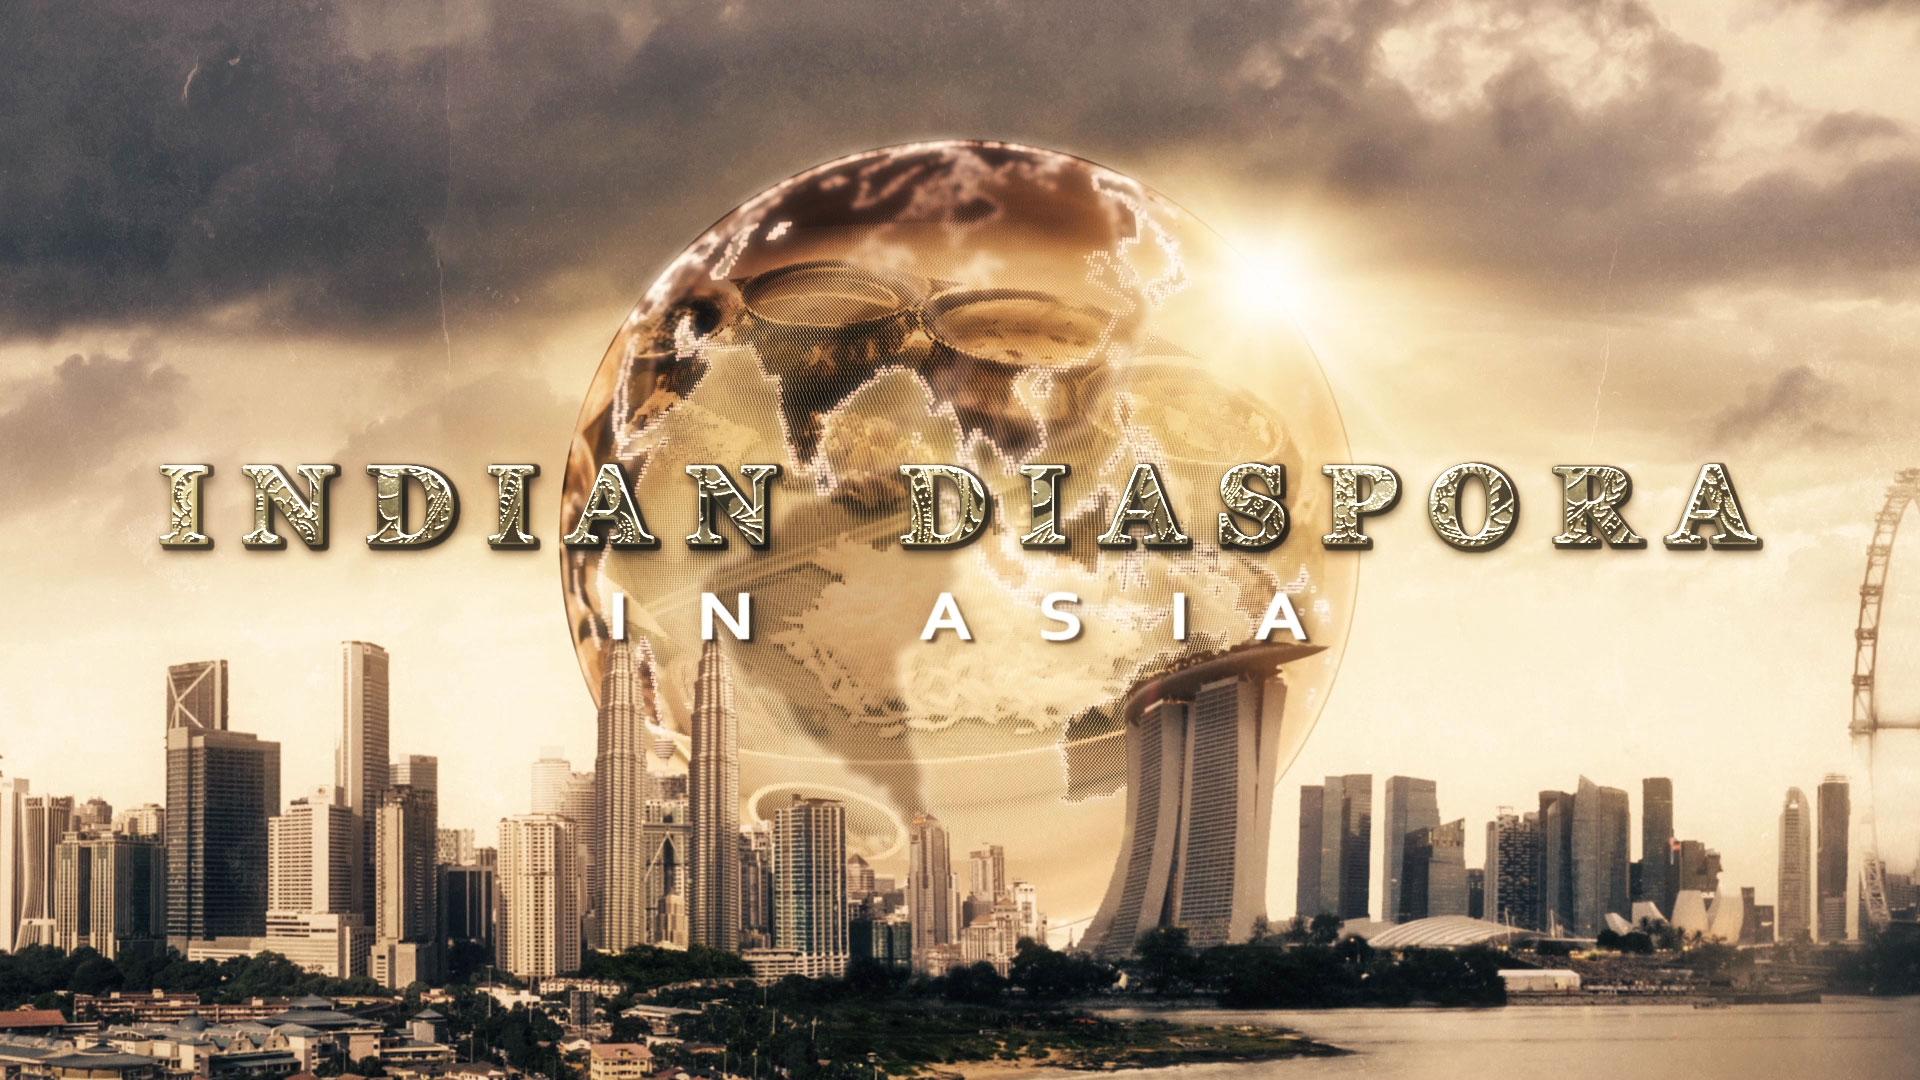 indian_diapora01w.jpg